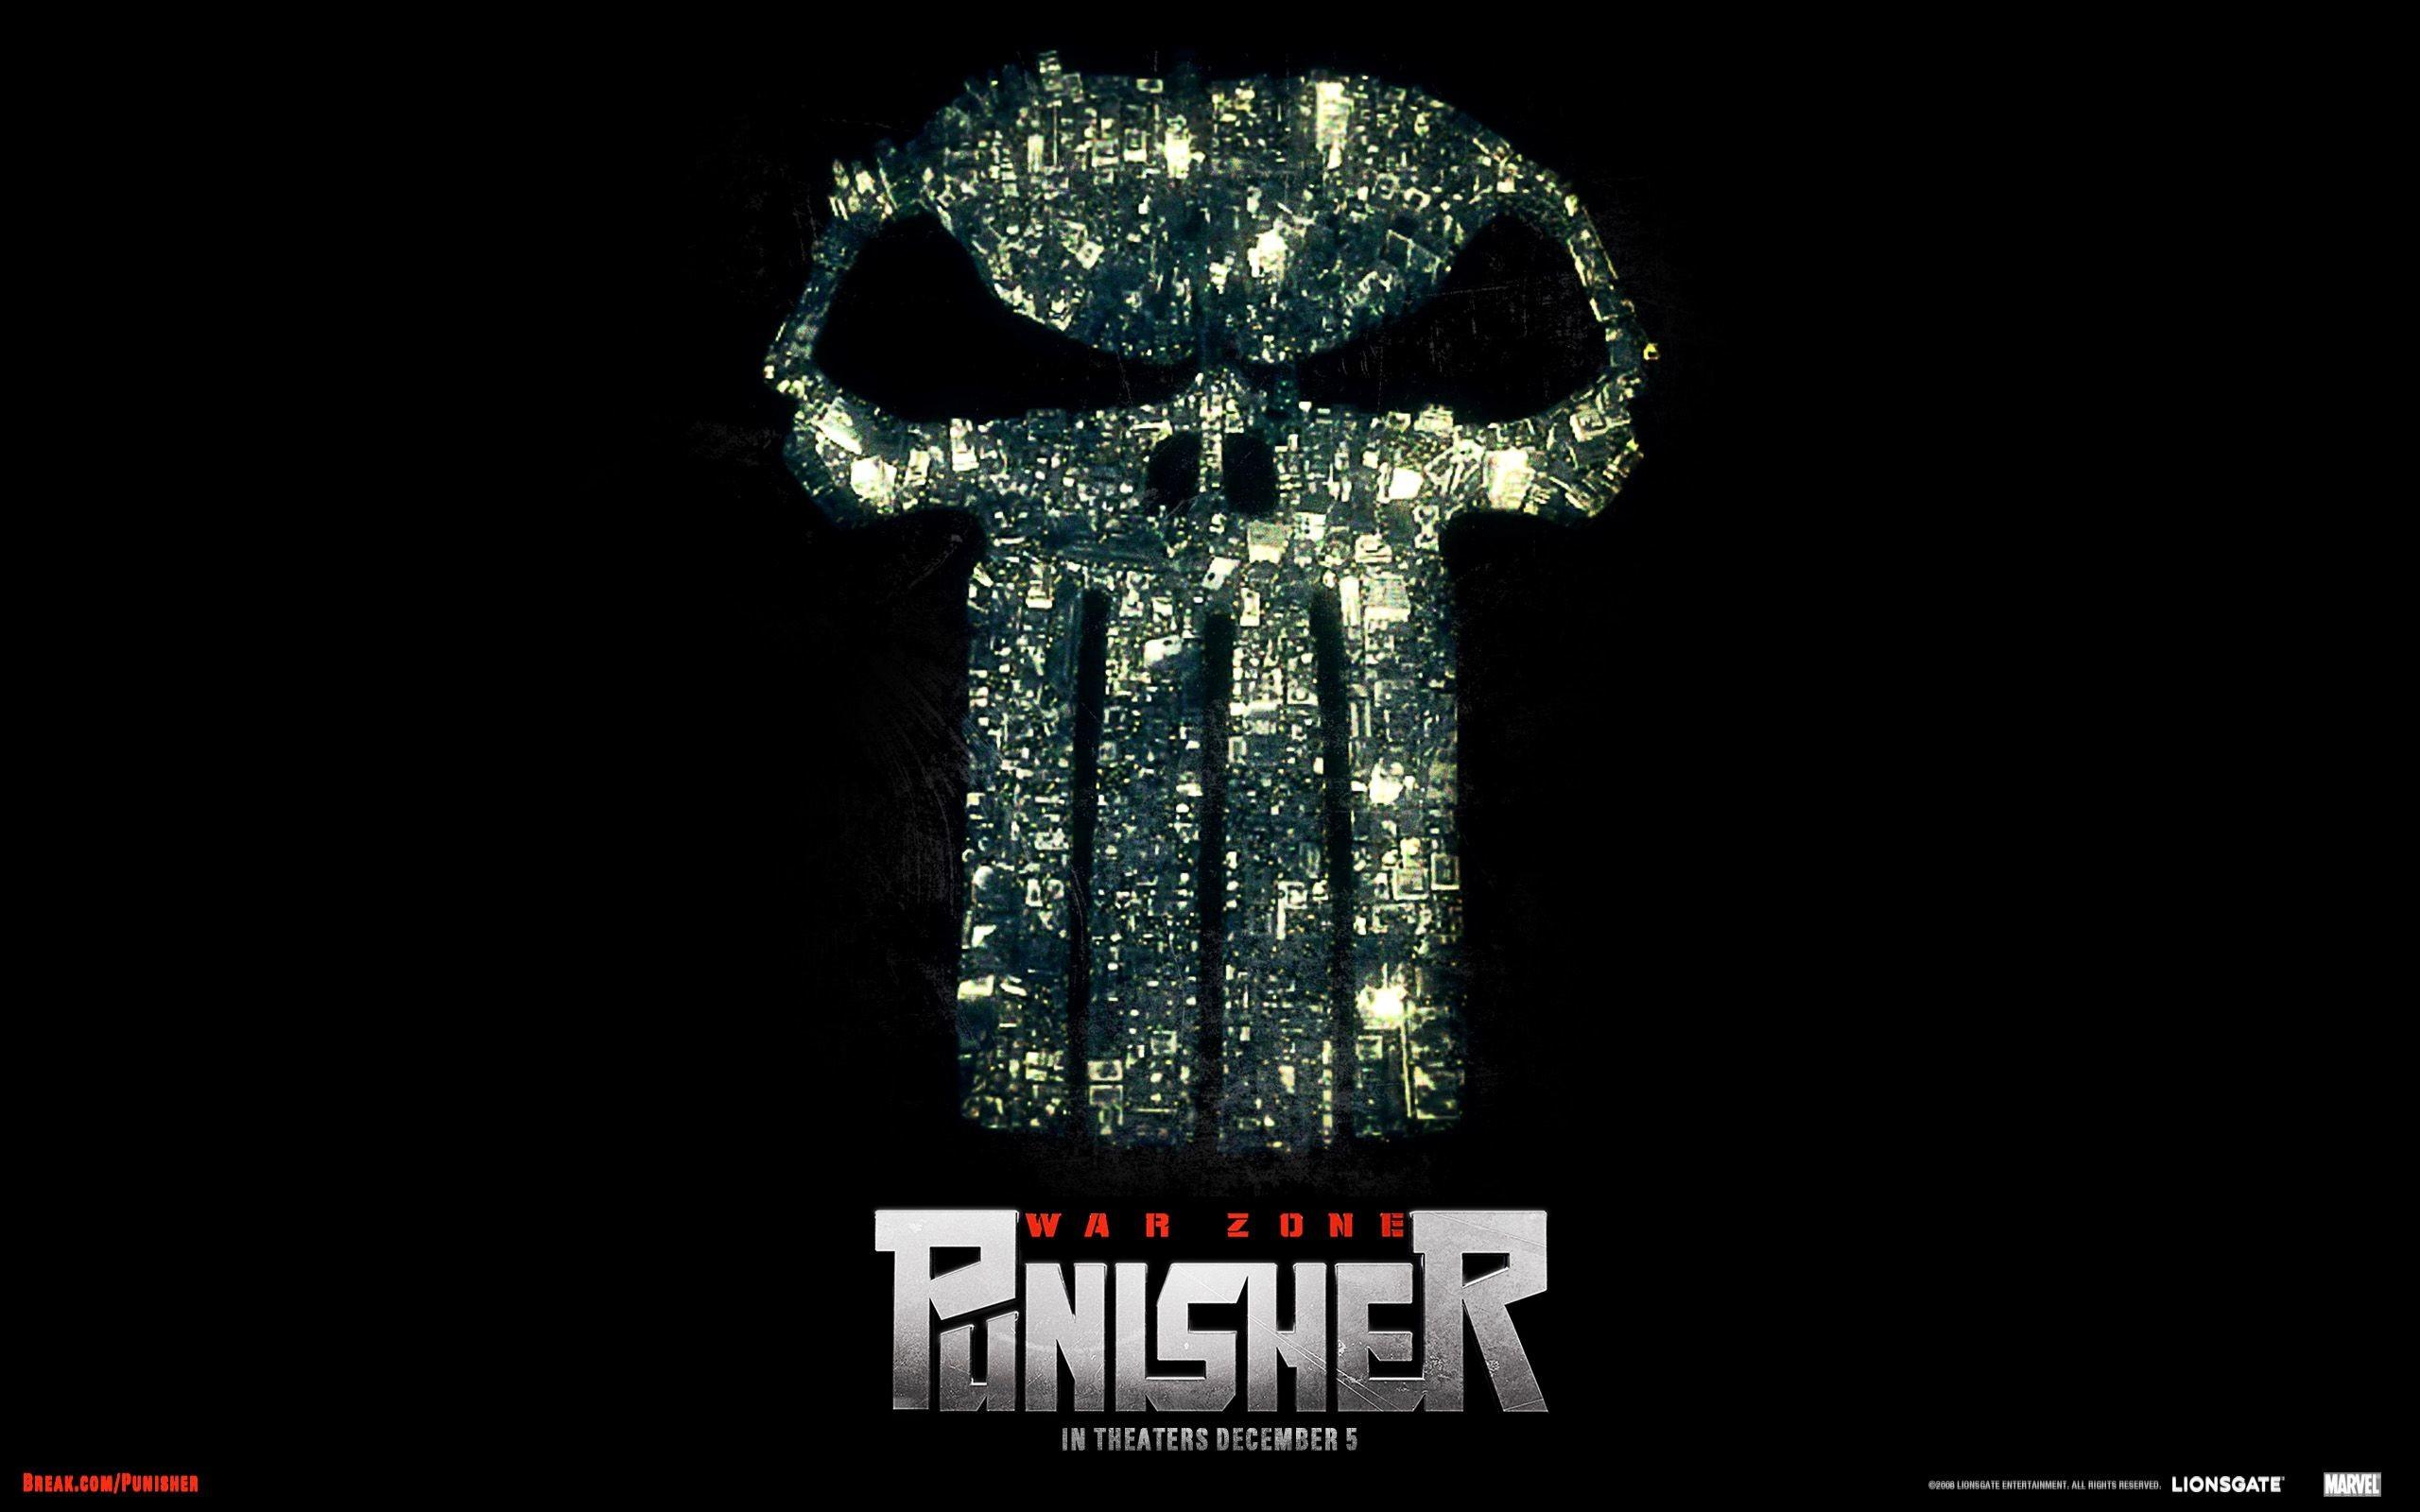 Punisher Official Punisher: War Zone Wallpaper 6 Wallpaper .